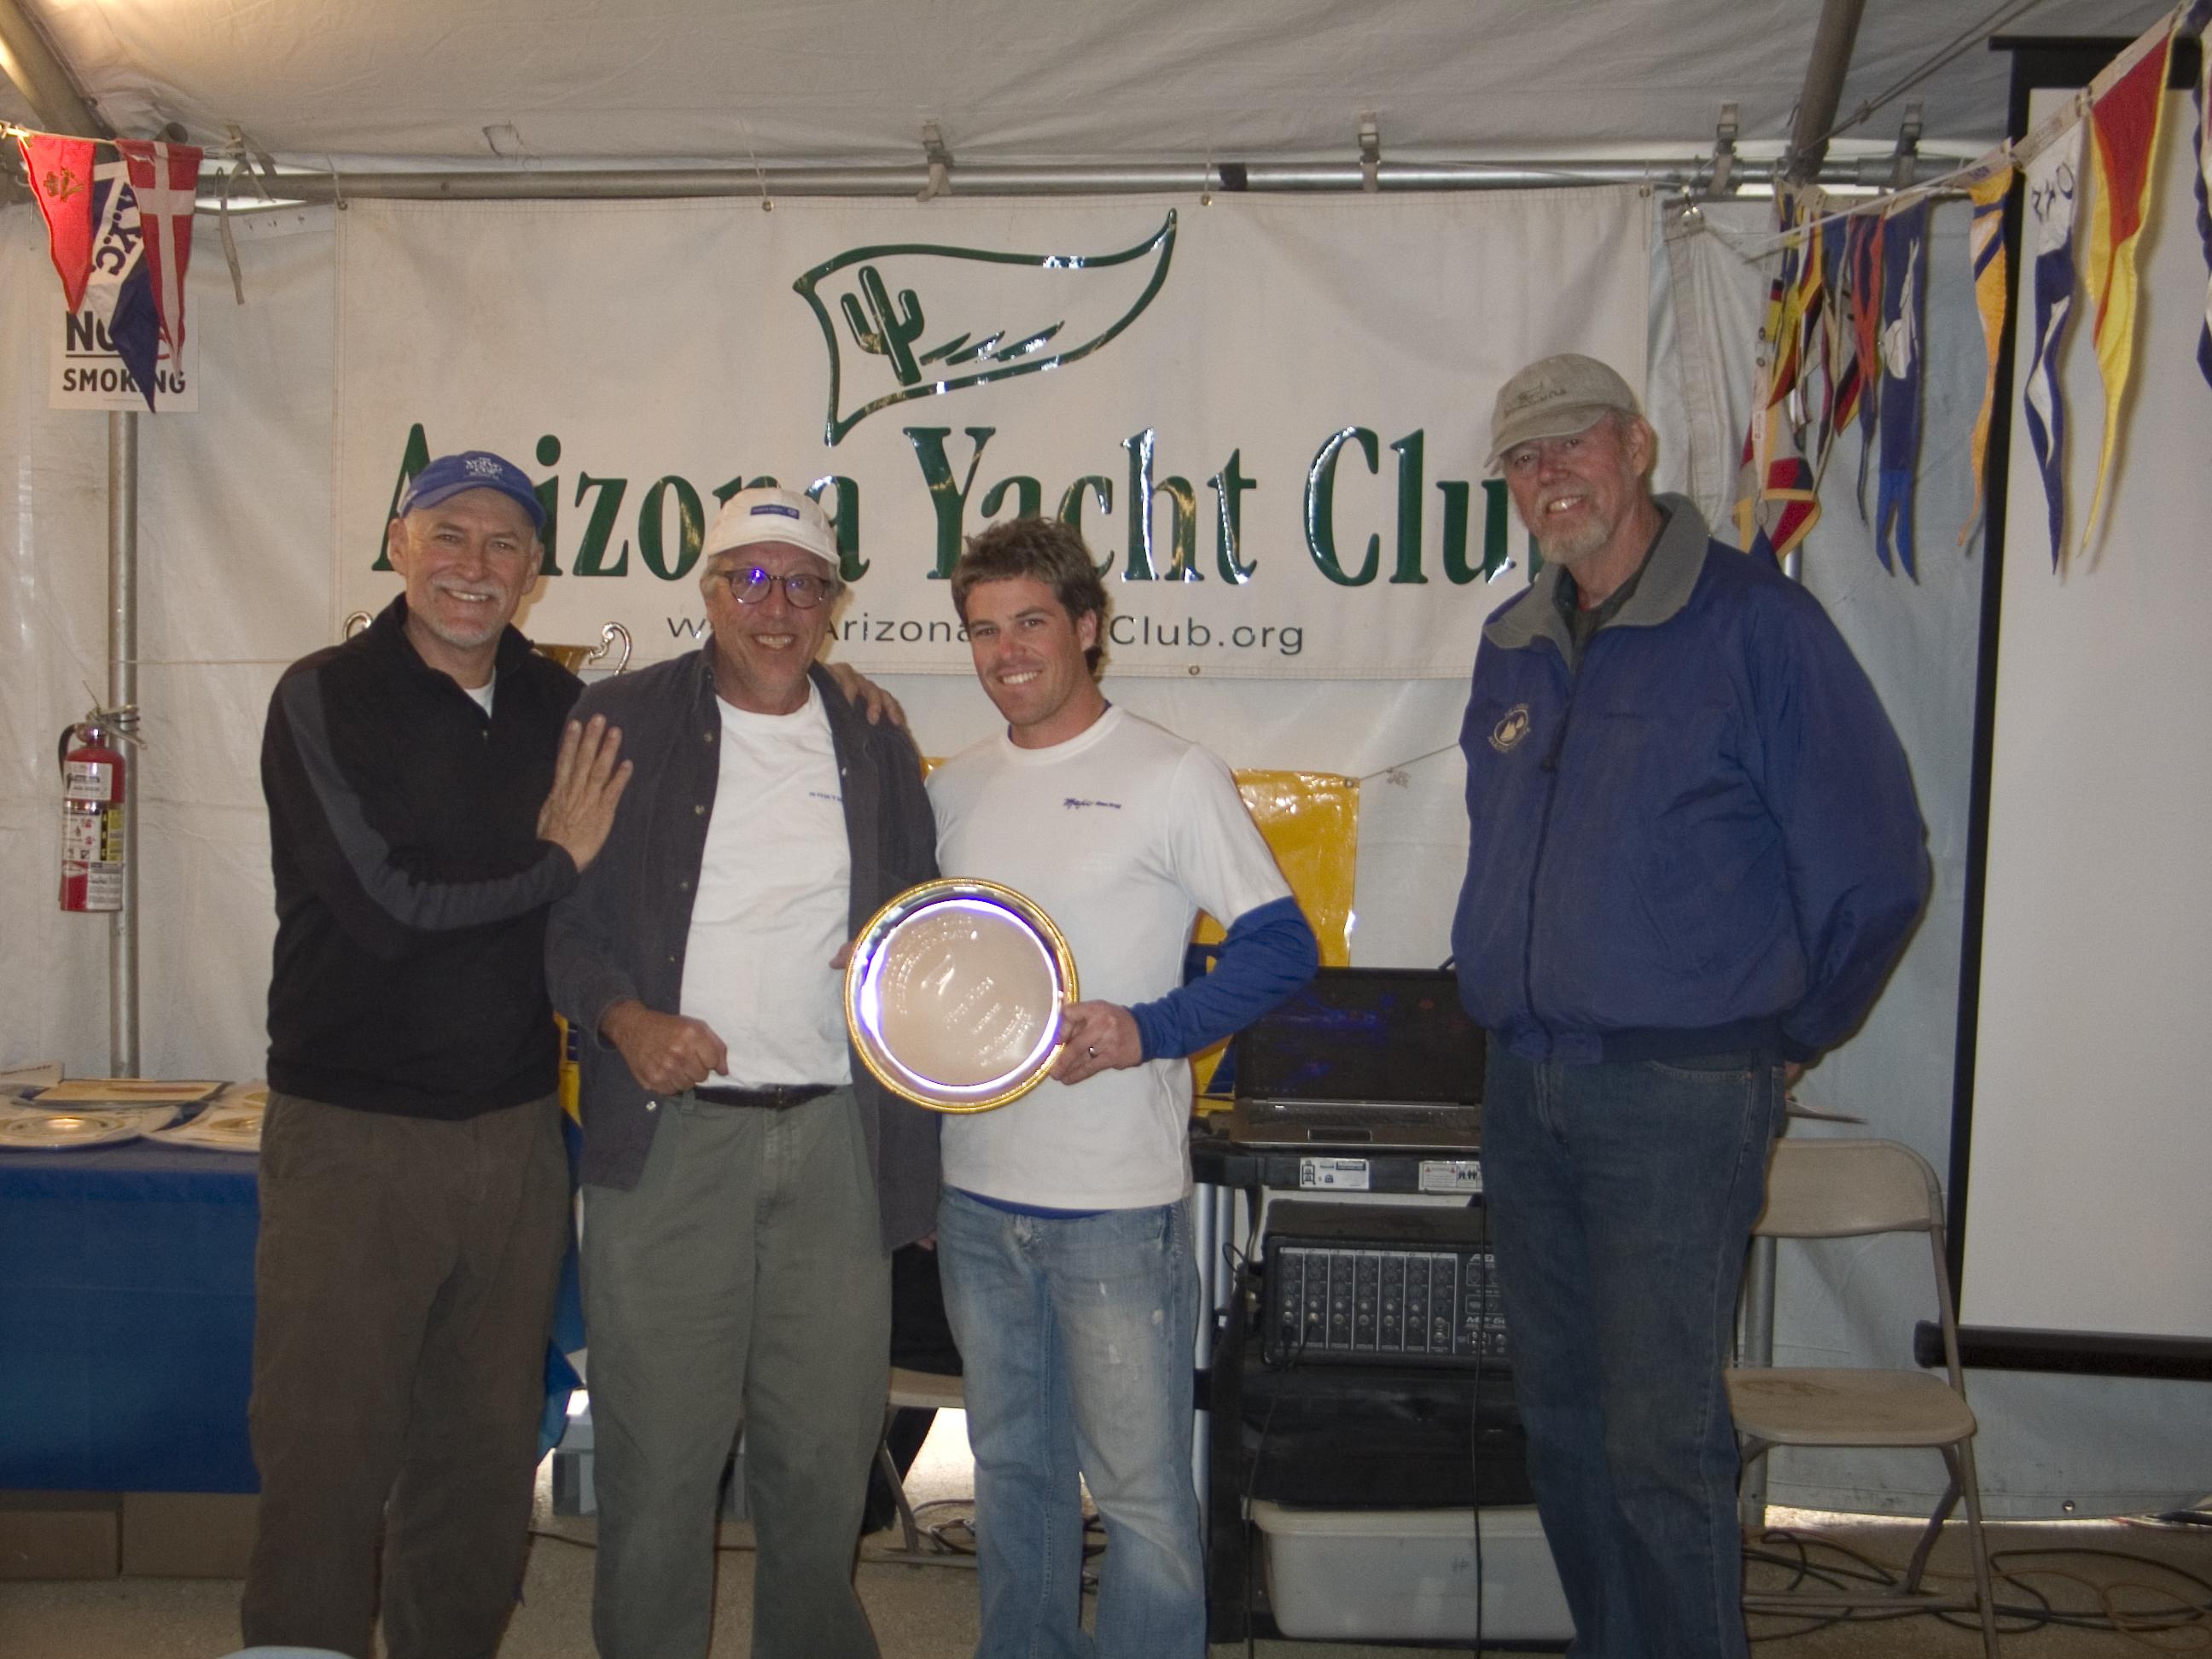 2012 Birthday Regatta Leukemia Cup Results Arizona Yacht